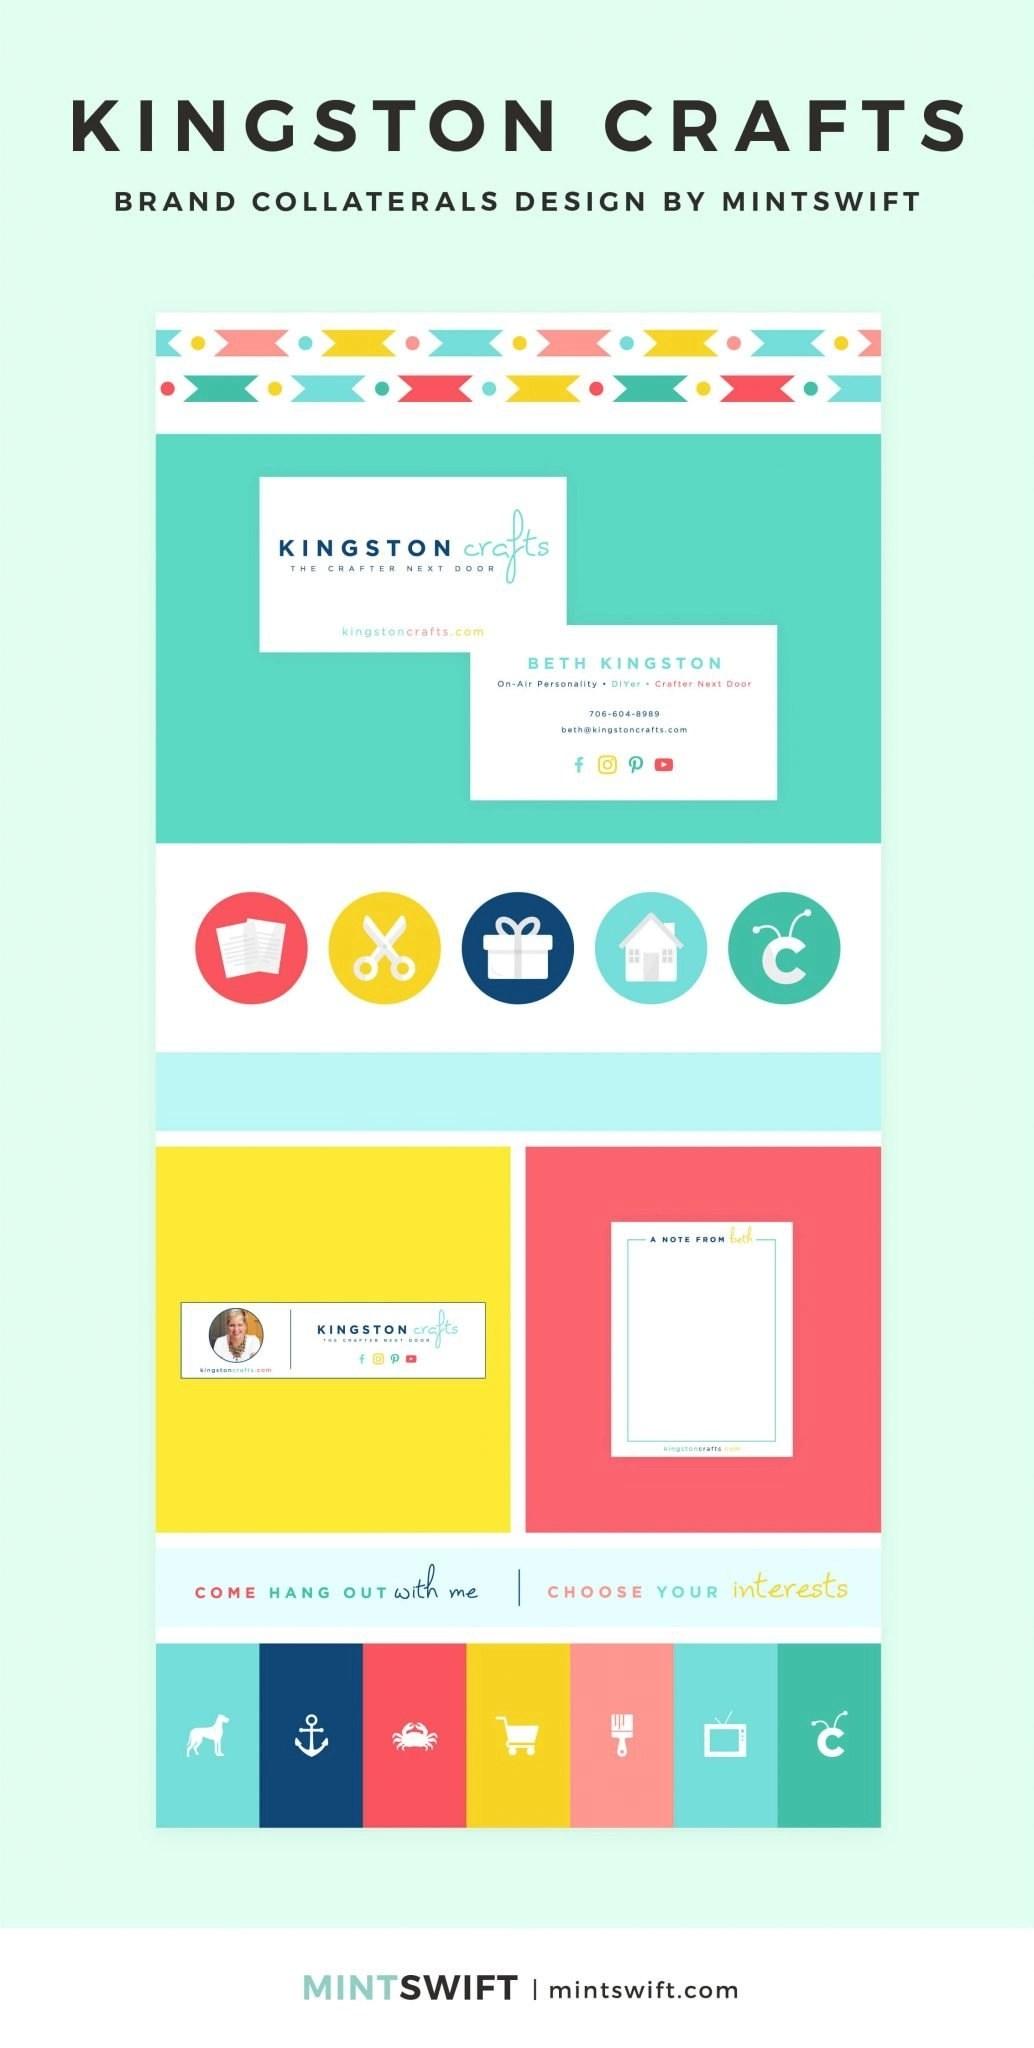 Kingston Crafts - Brand Collaterals Design - MintSwift - Adrianna Leszczynska